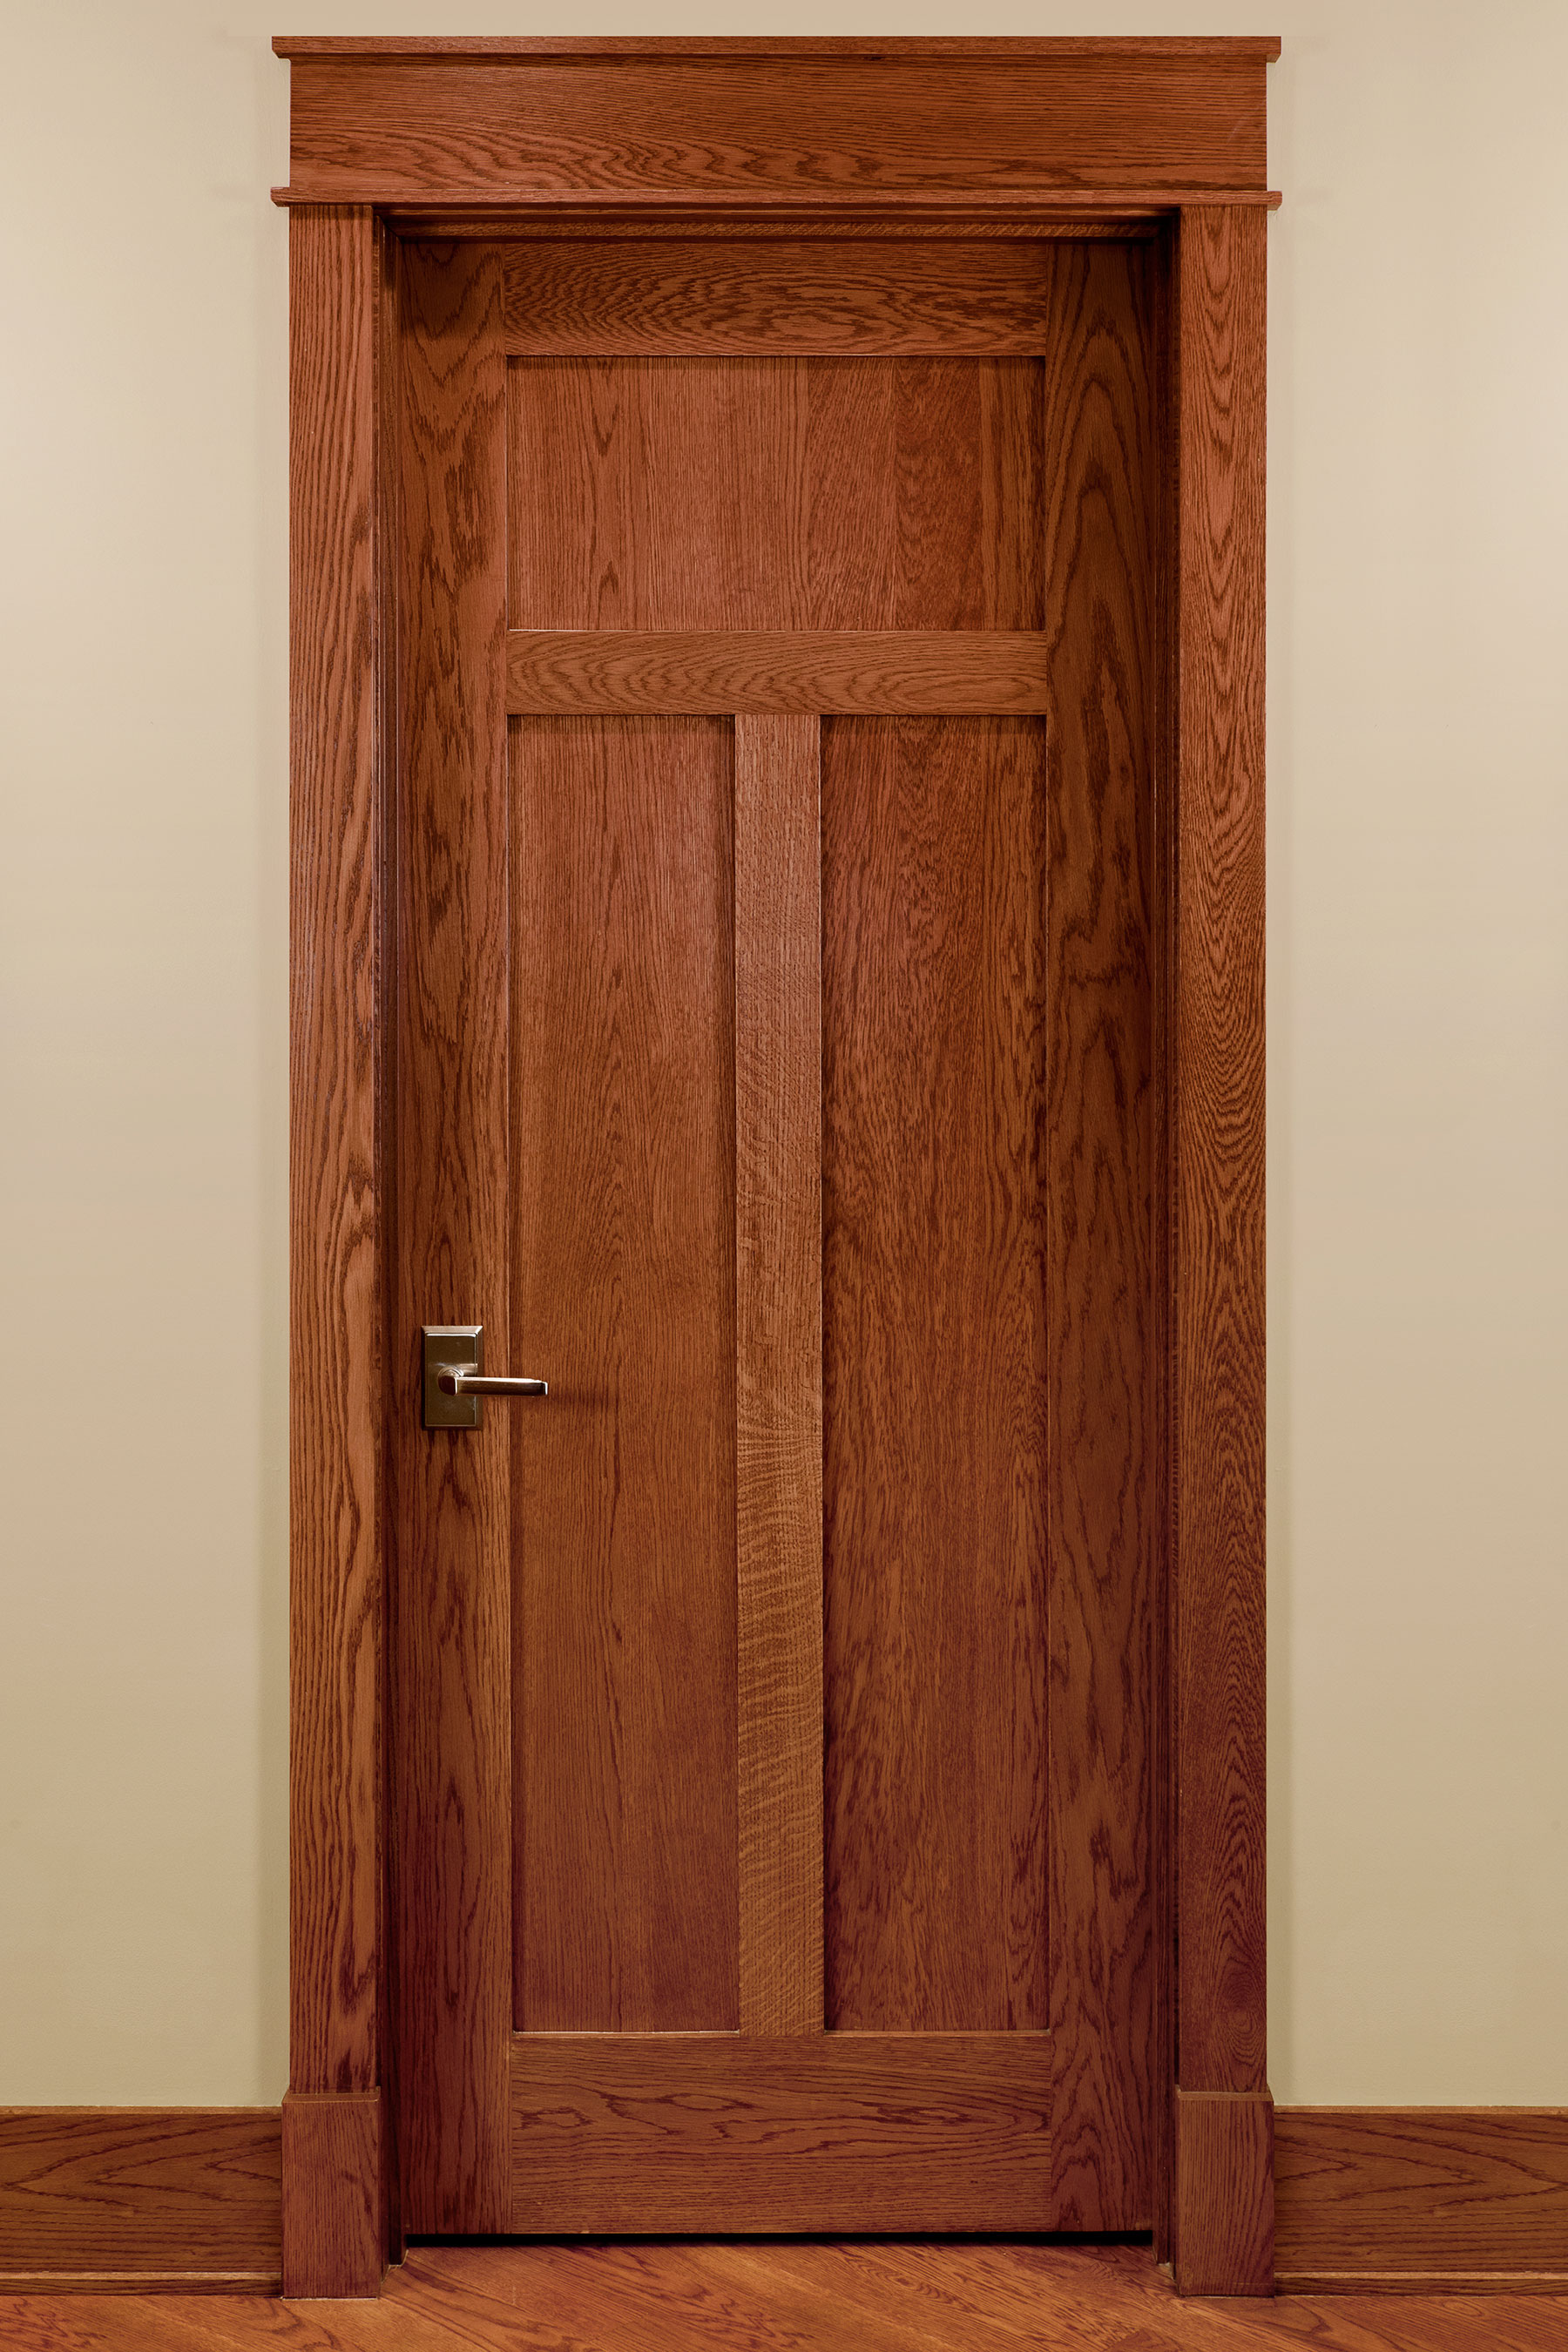 Custom Wood Interior Doors   Craftsman Style Custom Interior Wood Doors    Glenview Haus   Custom